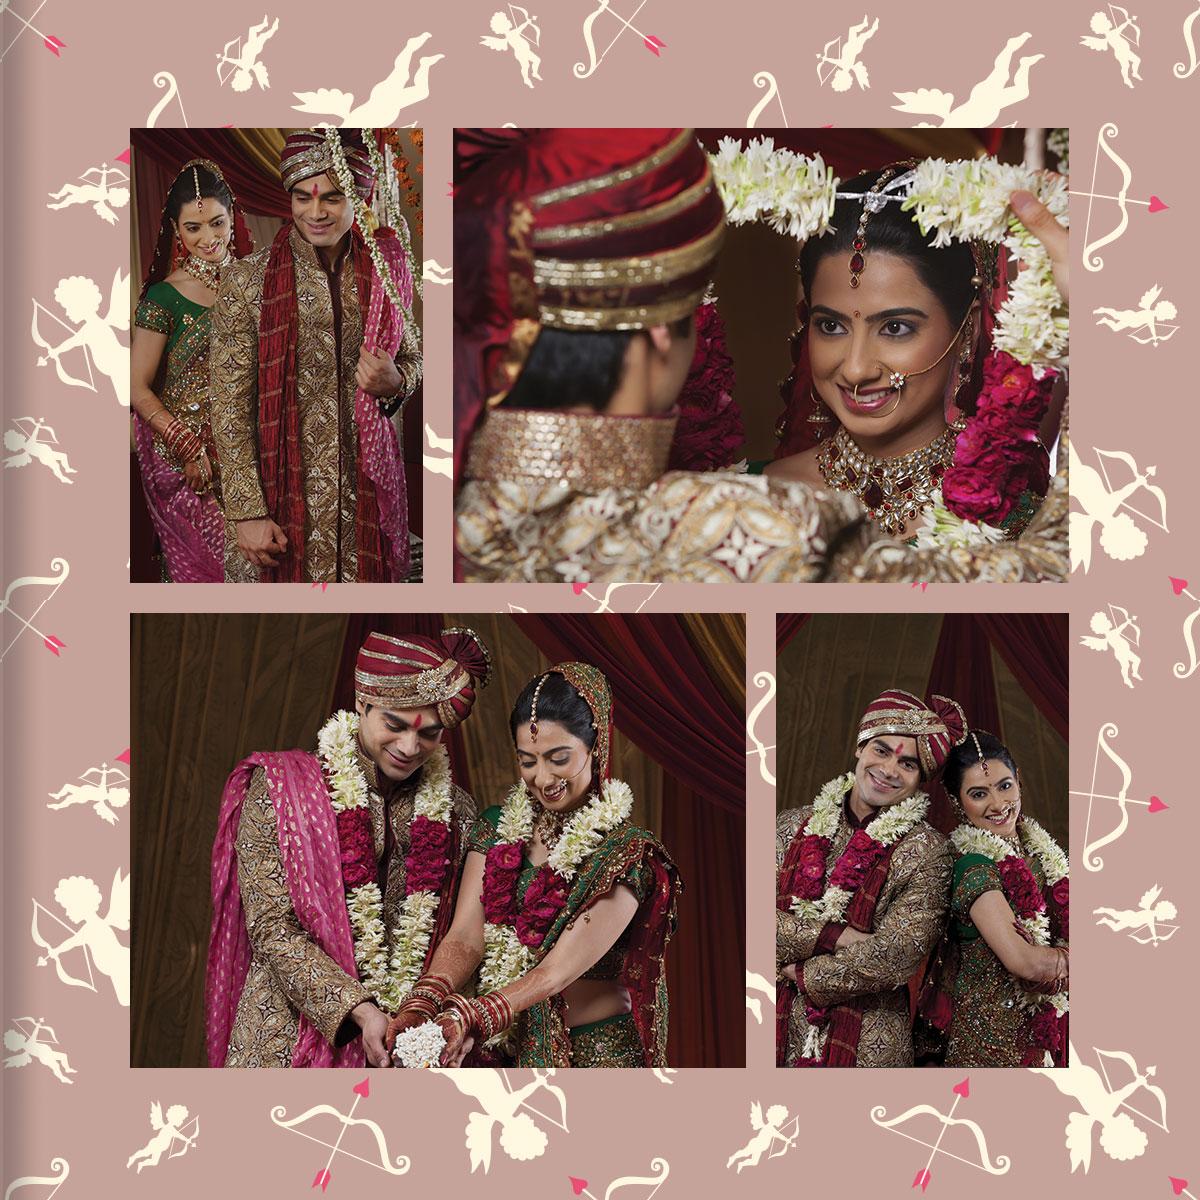 Photo Books Custom Photo Books Personalized Photo Books Online India